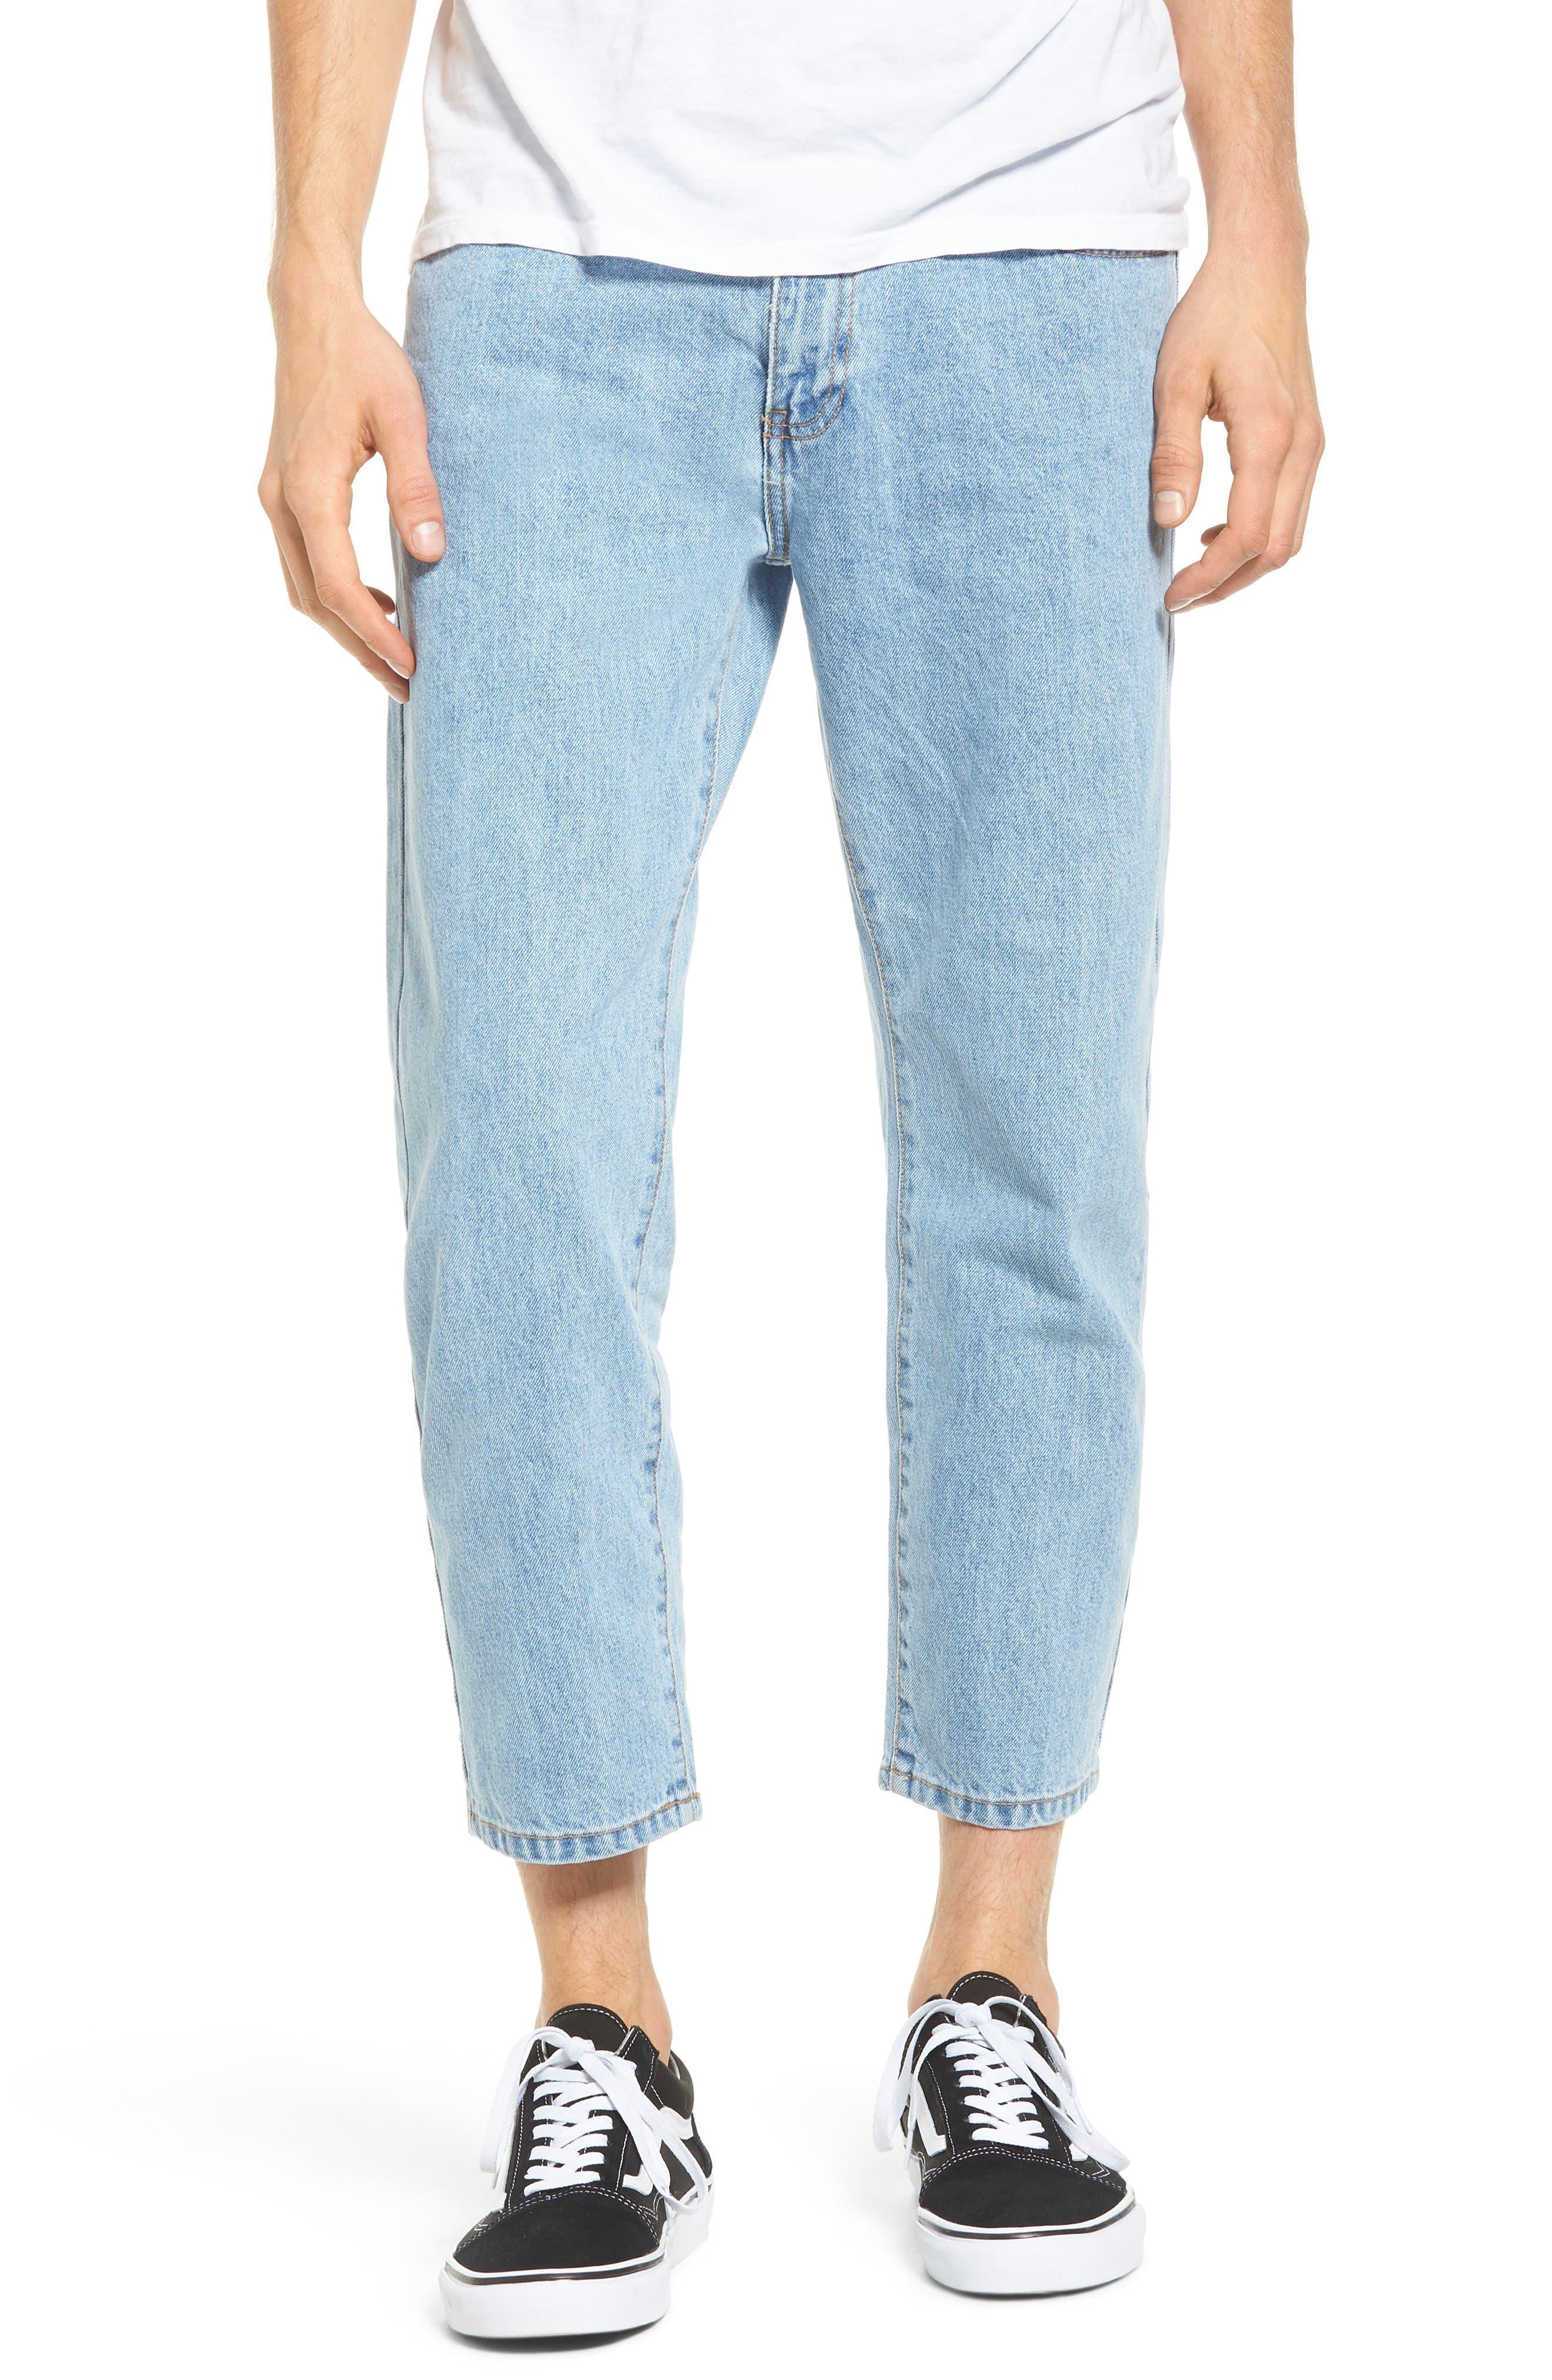 Otis Straight Fit Jeans,                         Main,                         color, 400